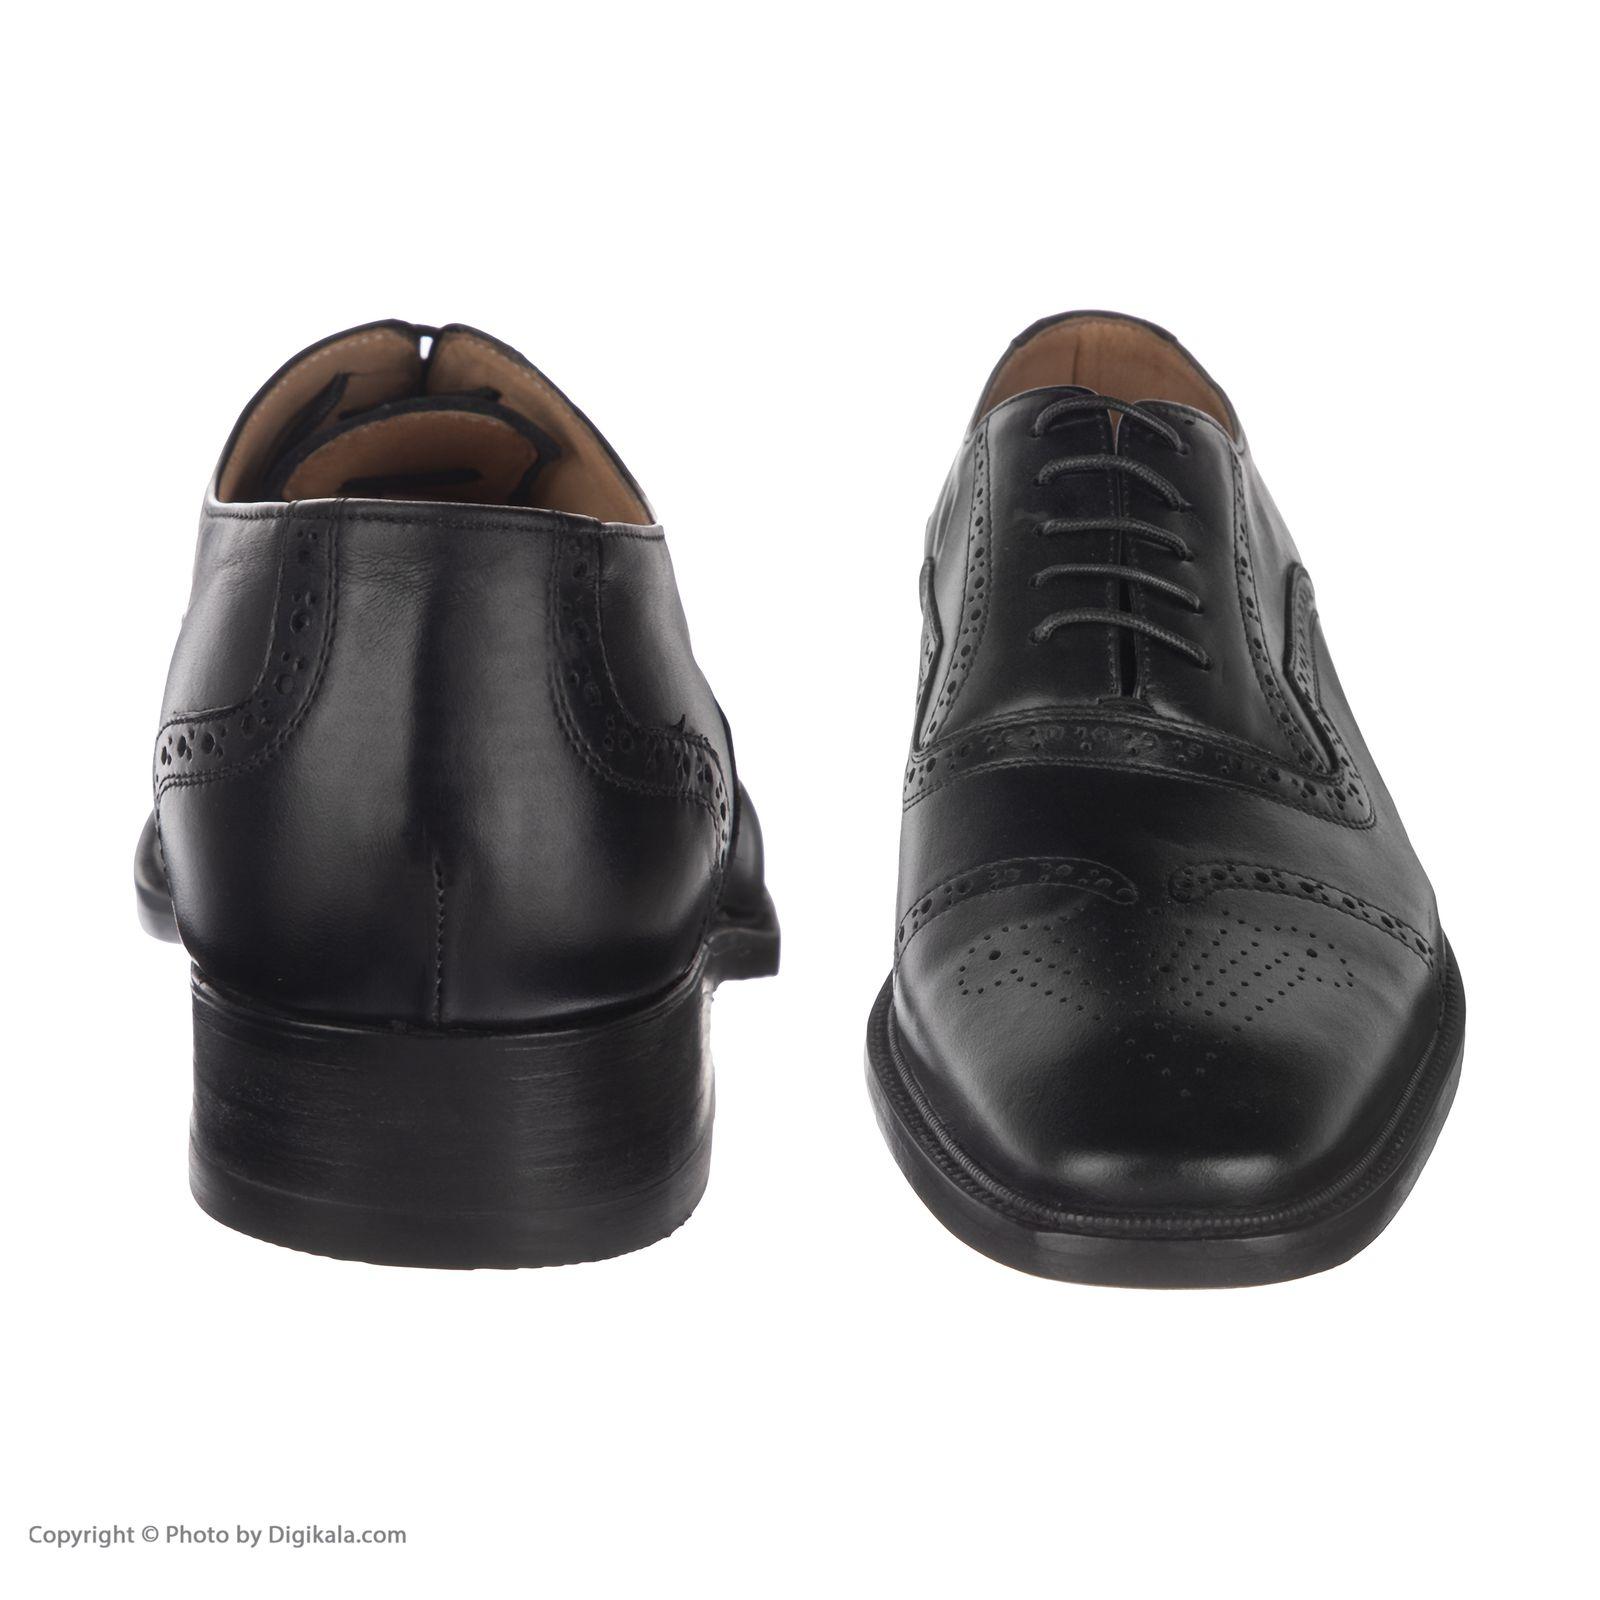 کفش مردانه نظری کد 433 -  - 2